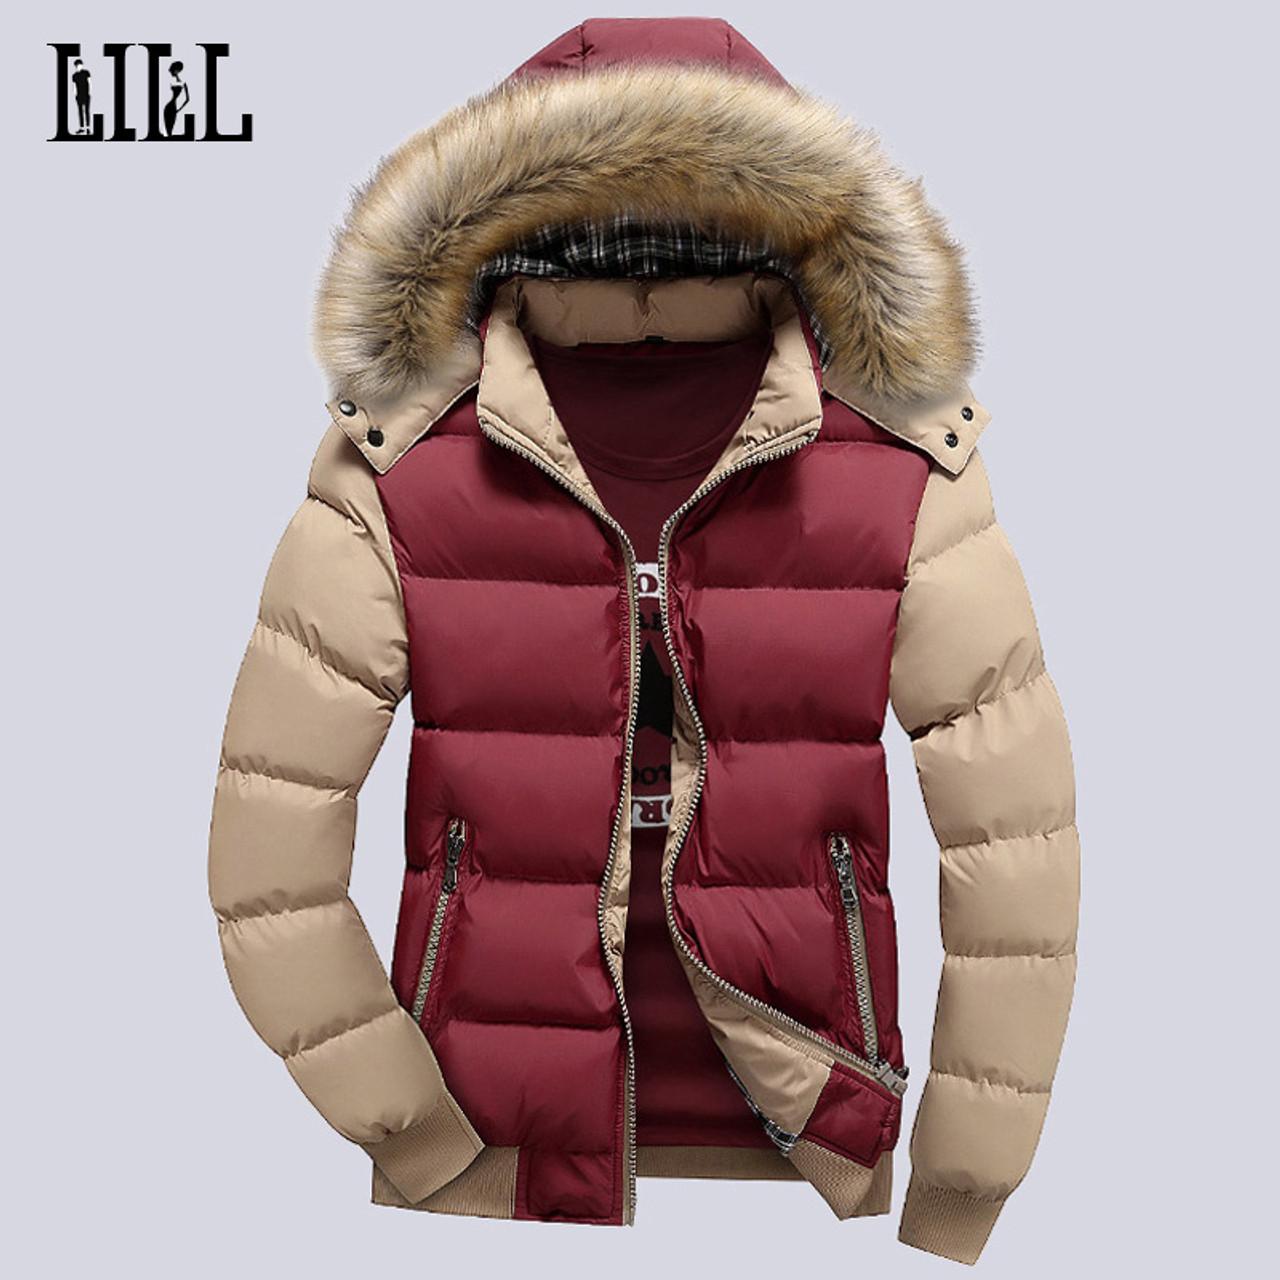 a74fc0e6b474 9 Color Fashion Brand Winter Men's Down Jacket With Fur Hood Hat Slim Men  Outwear Coat ...